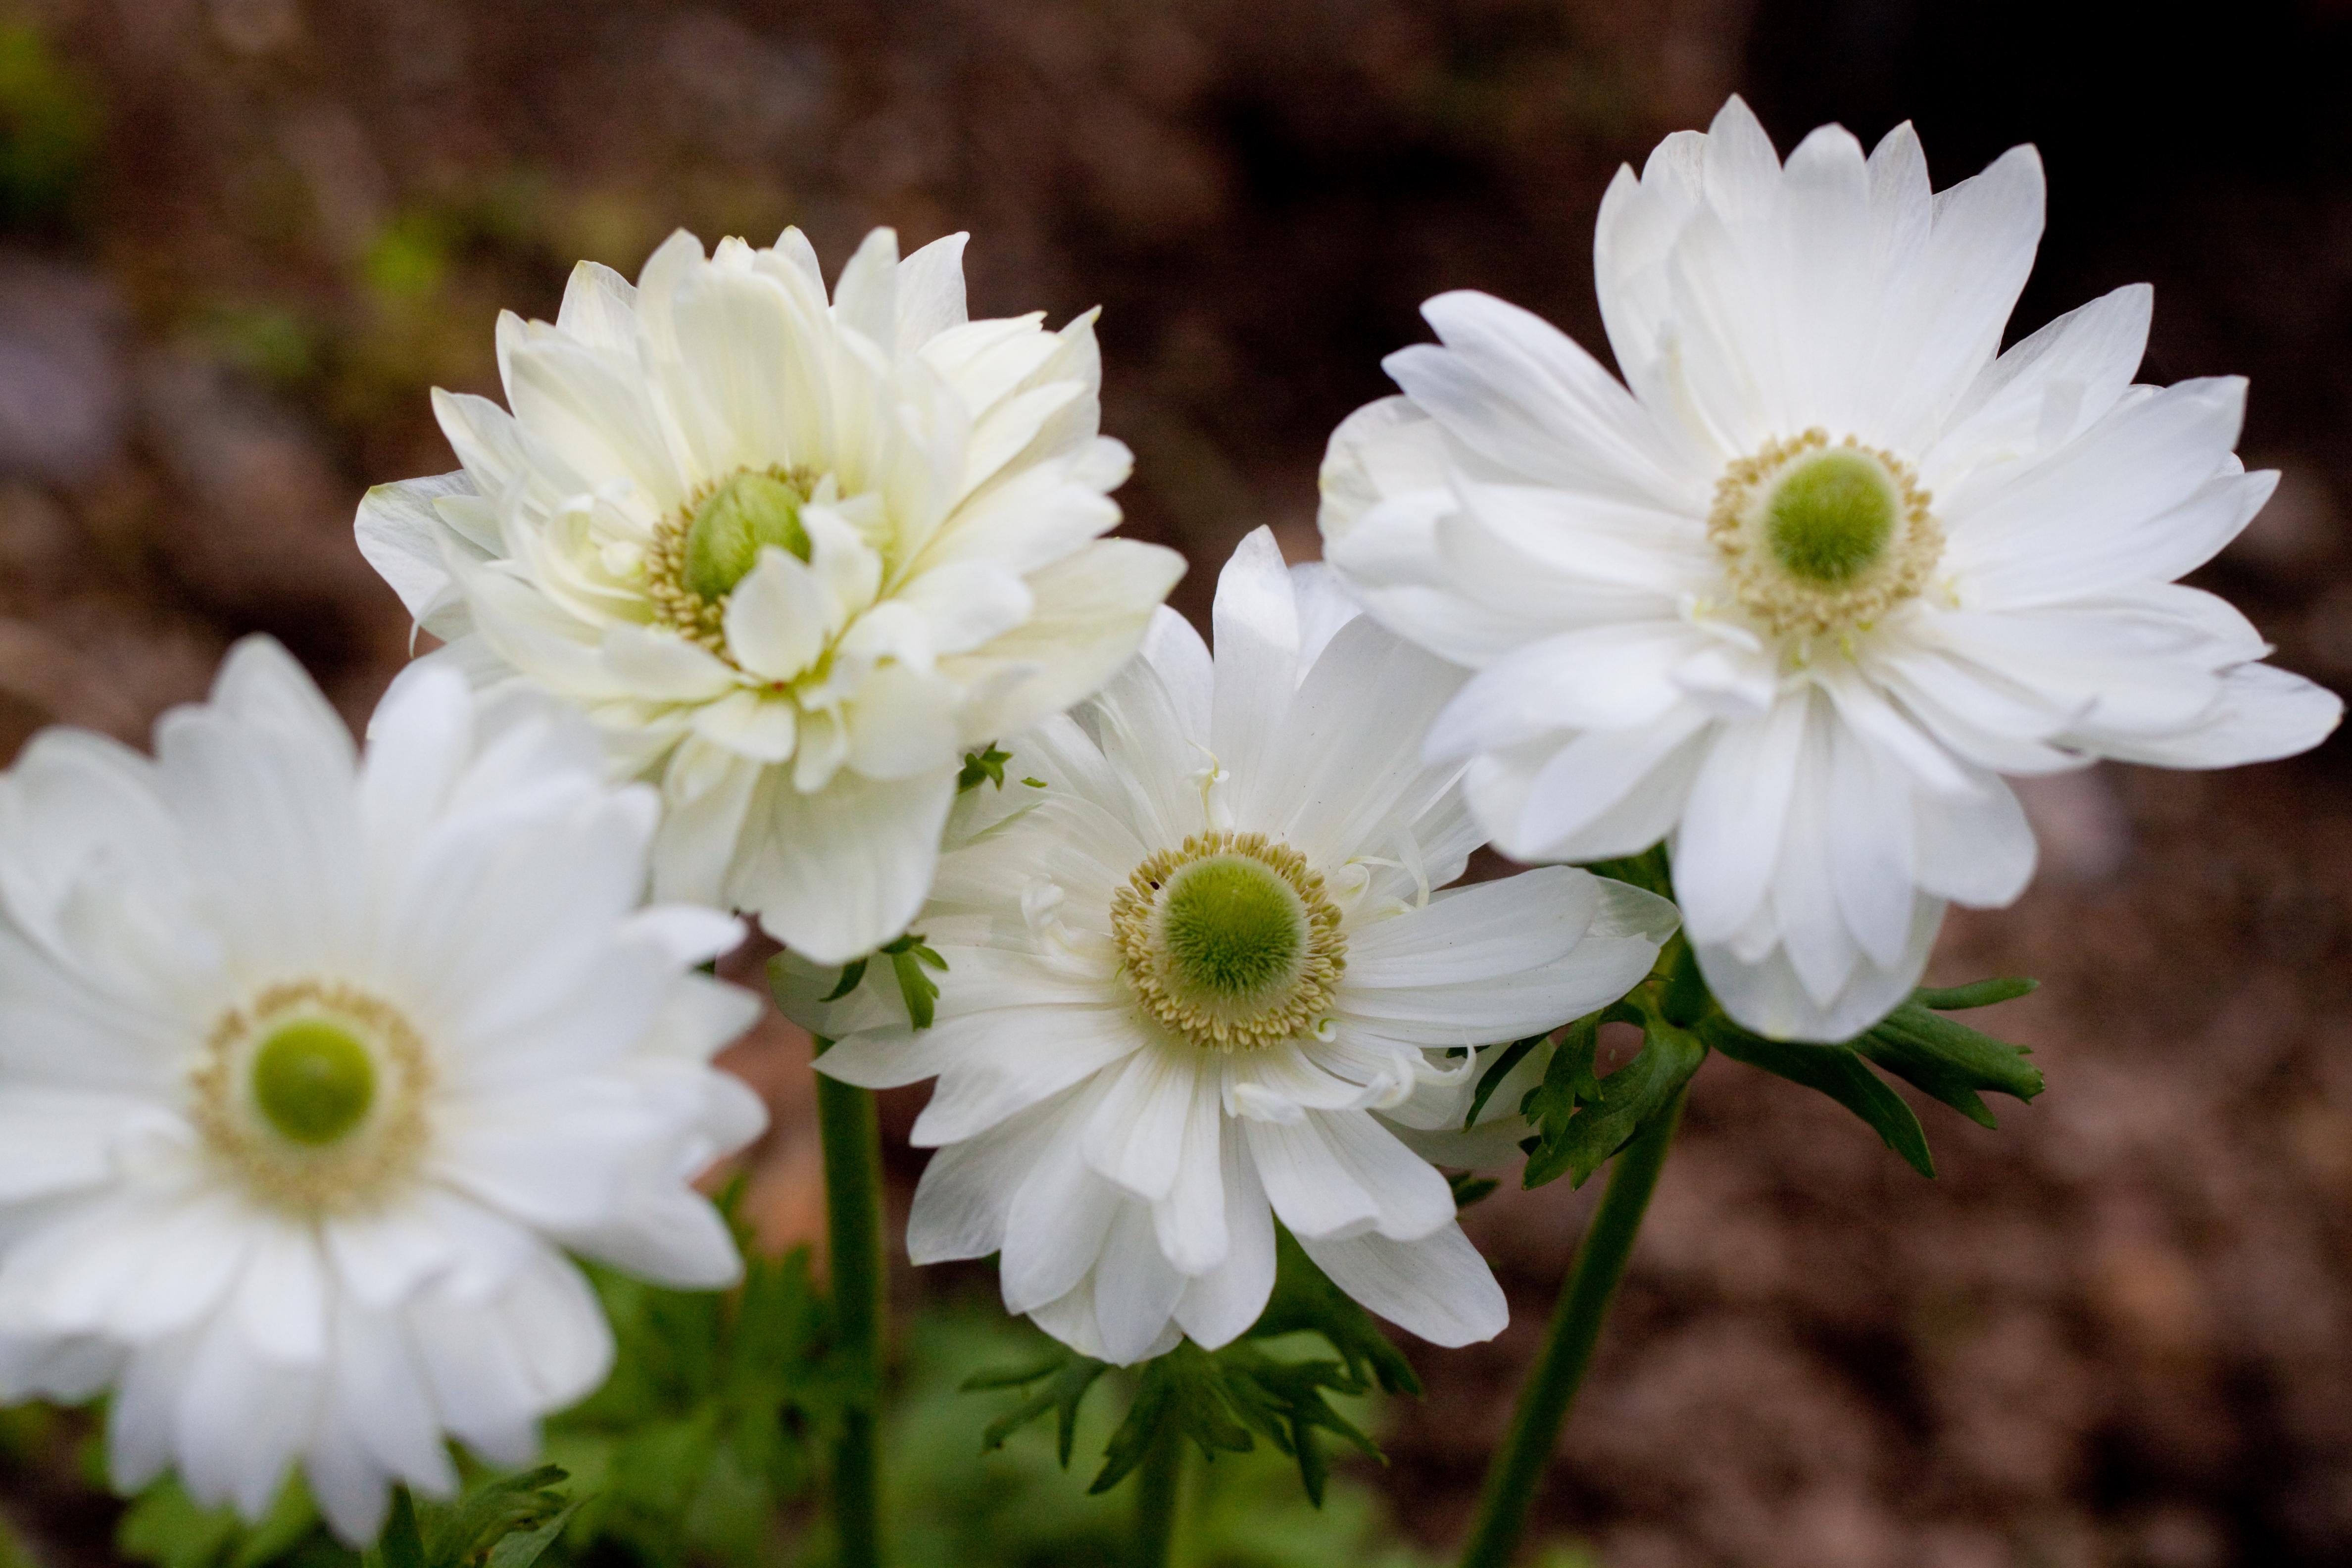 fileflower anemone flickr nekonomaniajpg